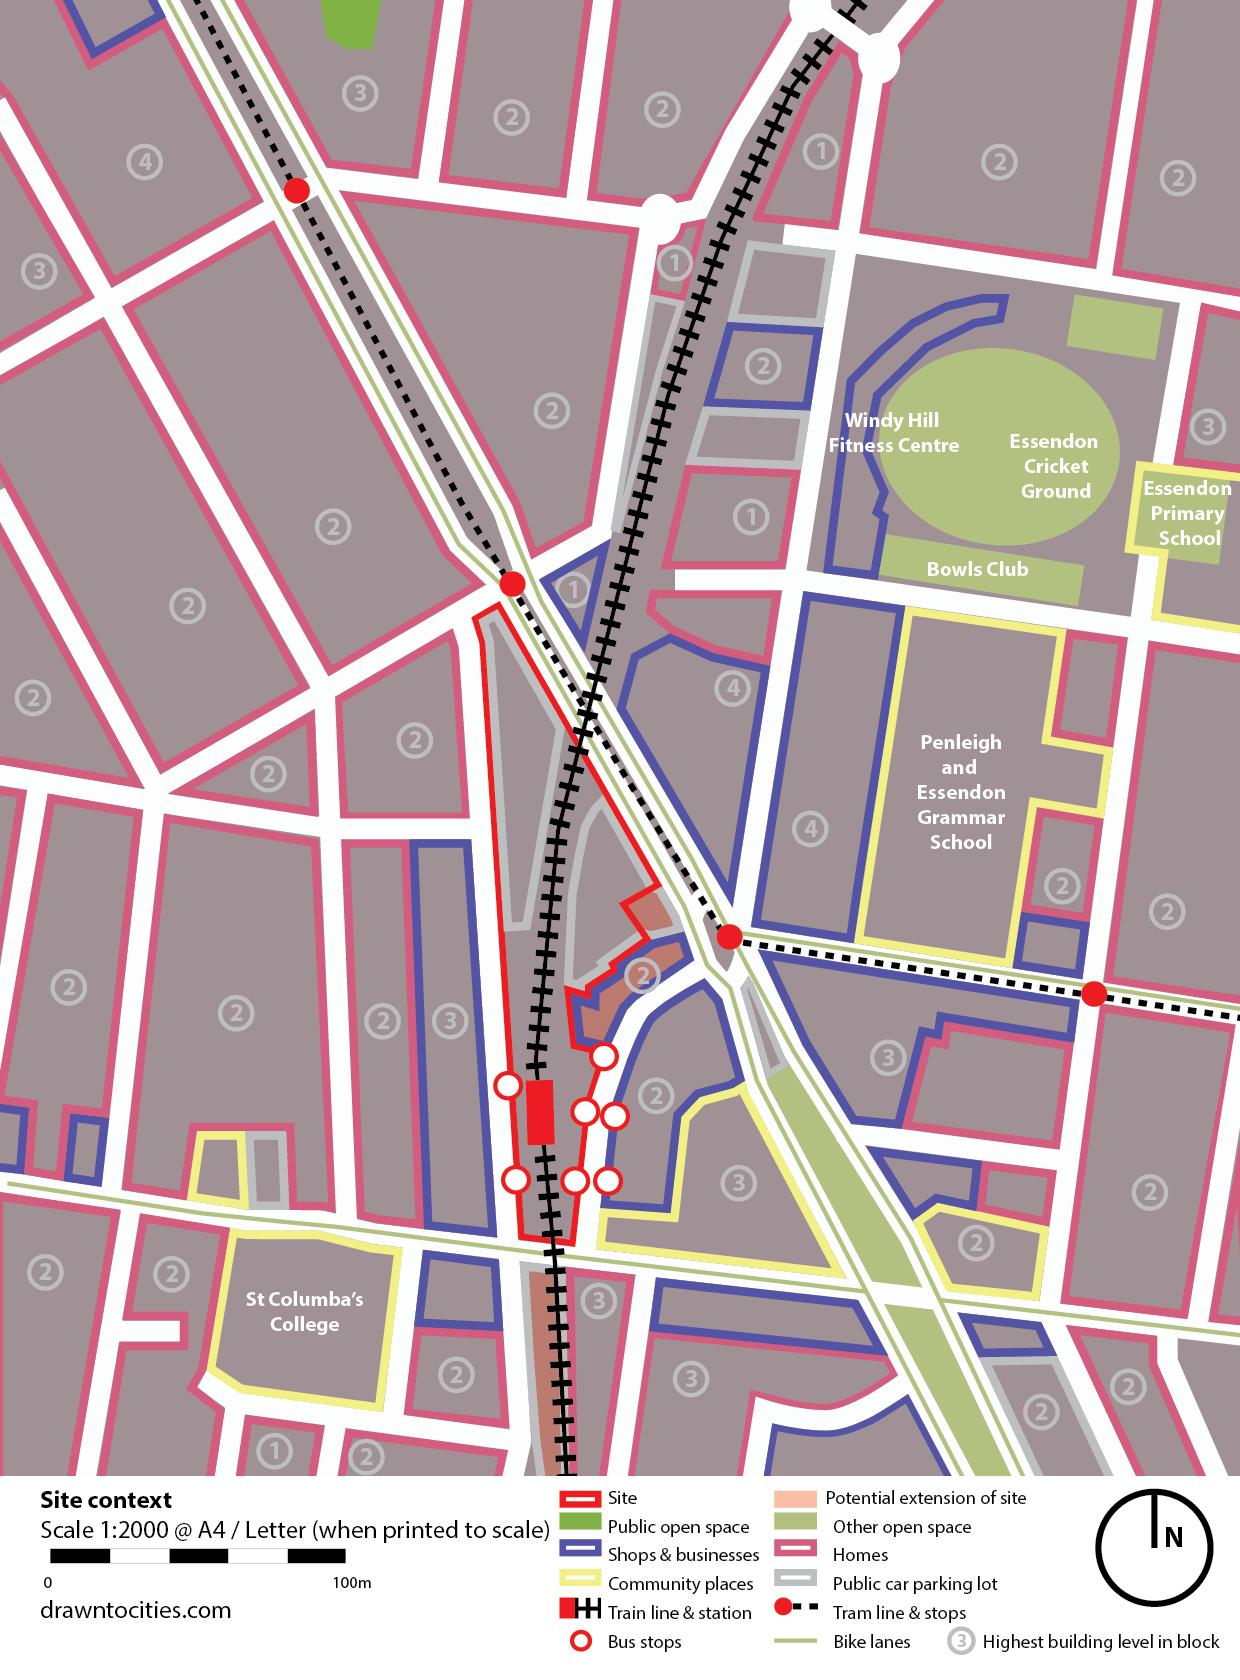 Essendon Station site context by Drawntocities.com